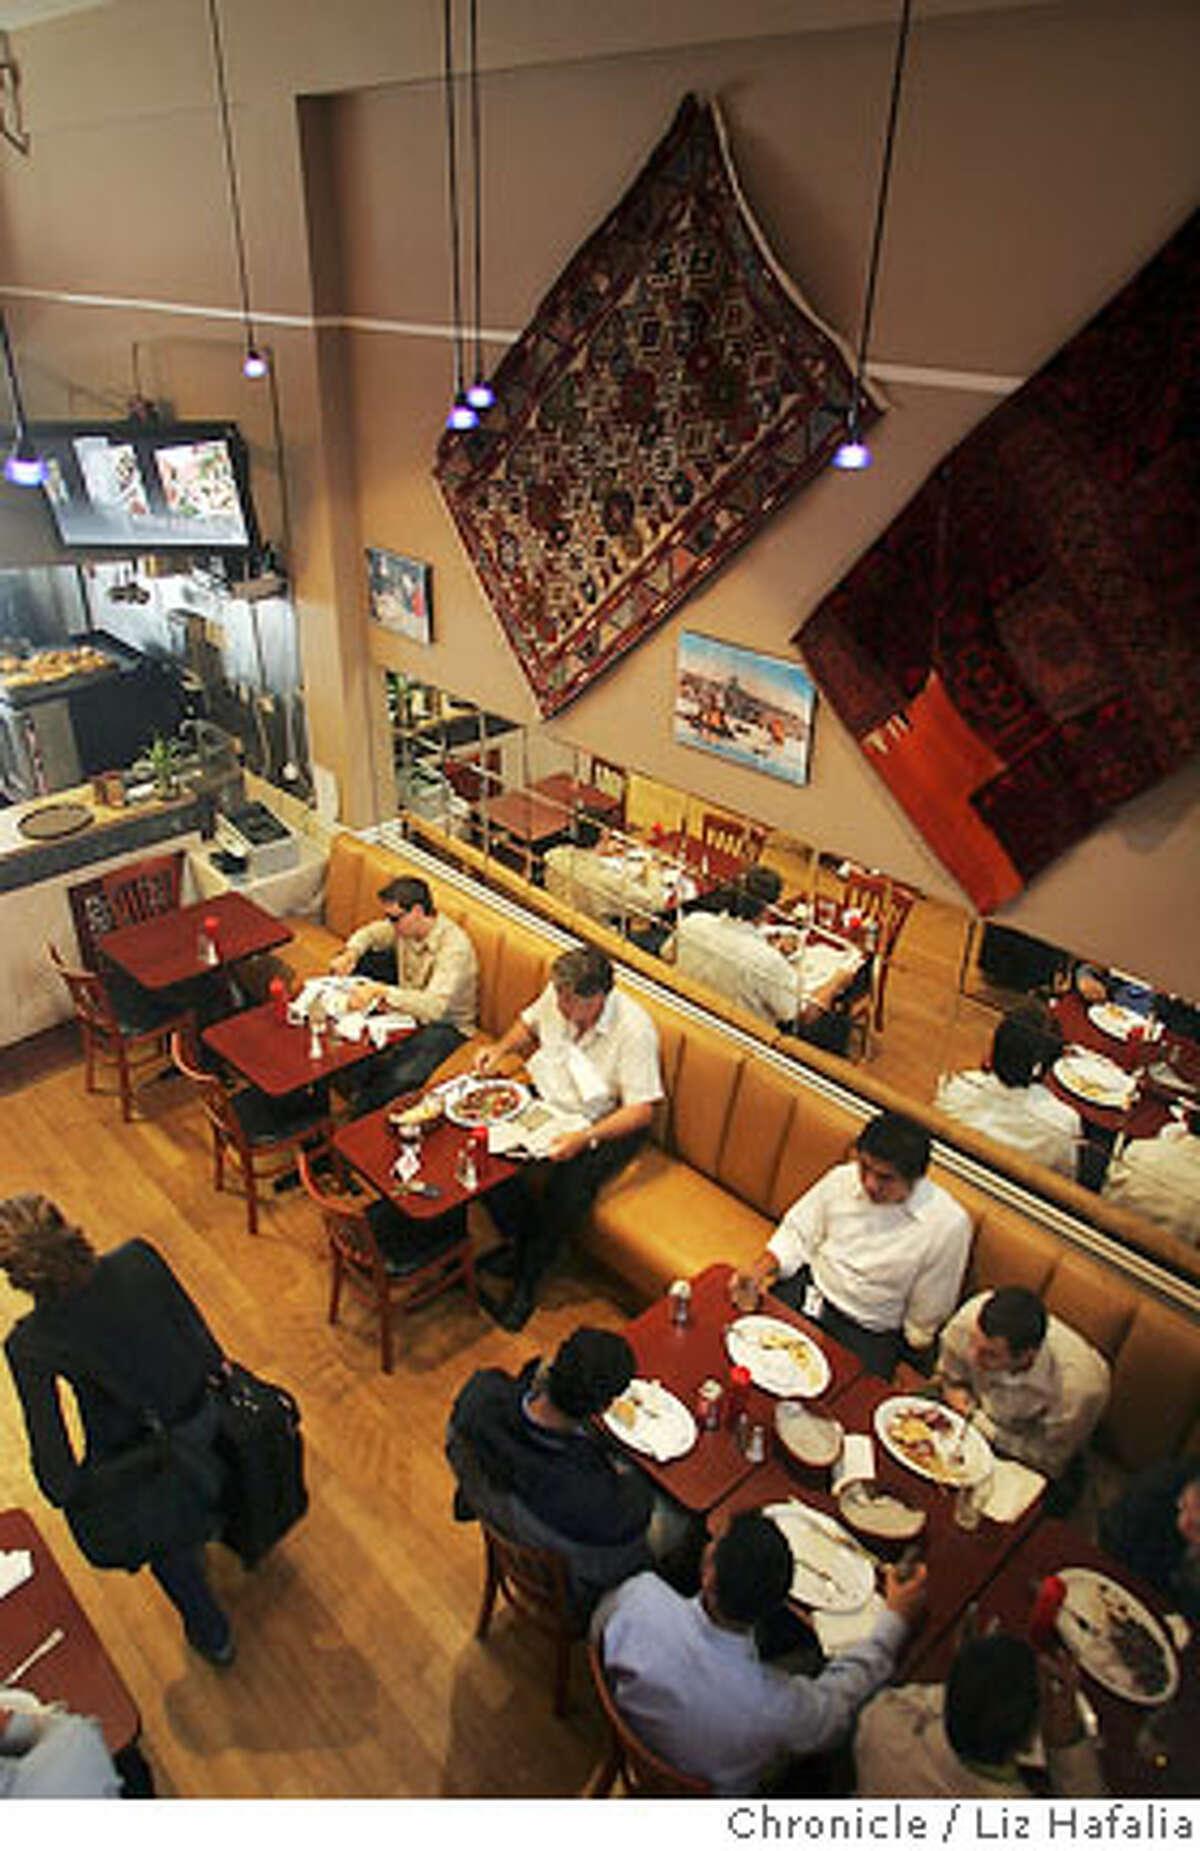 BARGAIN19_009_LH_.JPG Sultan Kebab, a Turkish restaurant on Larkin St.. Liz Hafalia/The Chronicle/San Francisco/7/11/07 ** cq